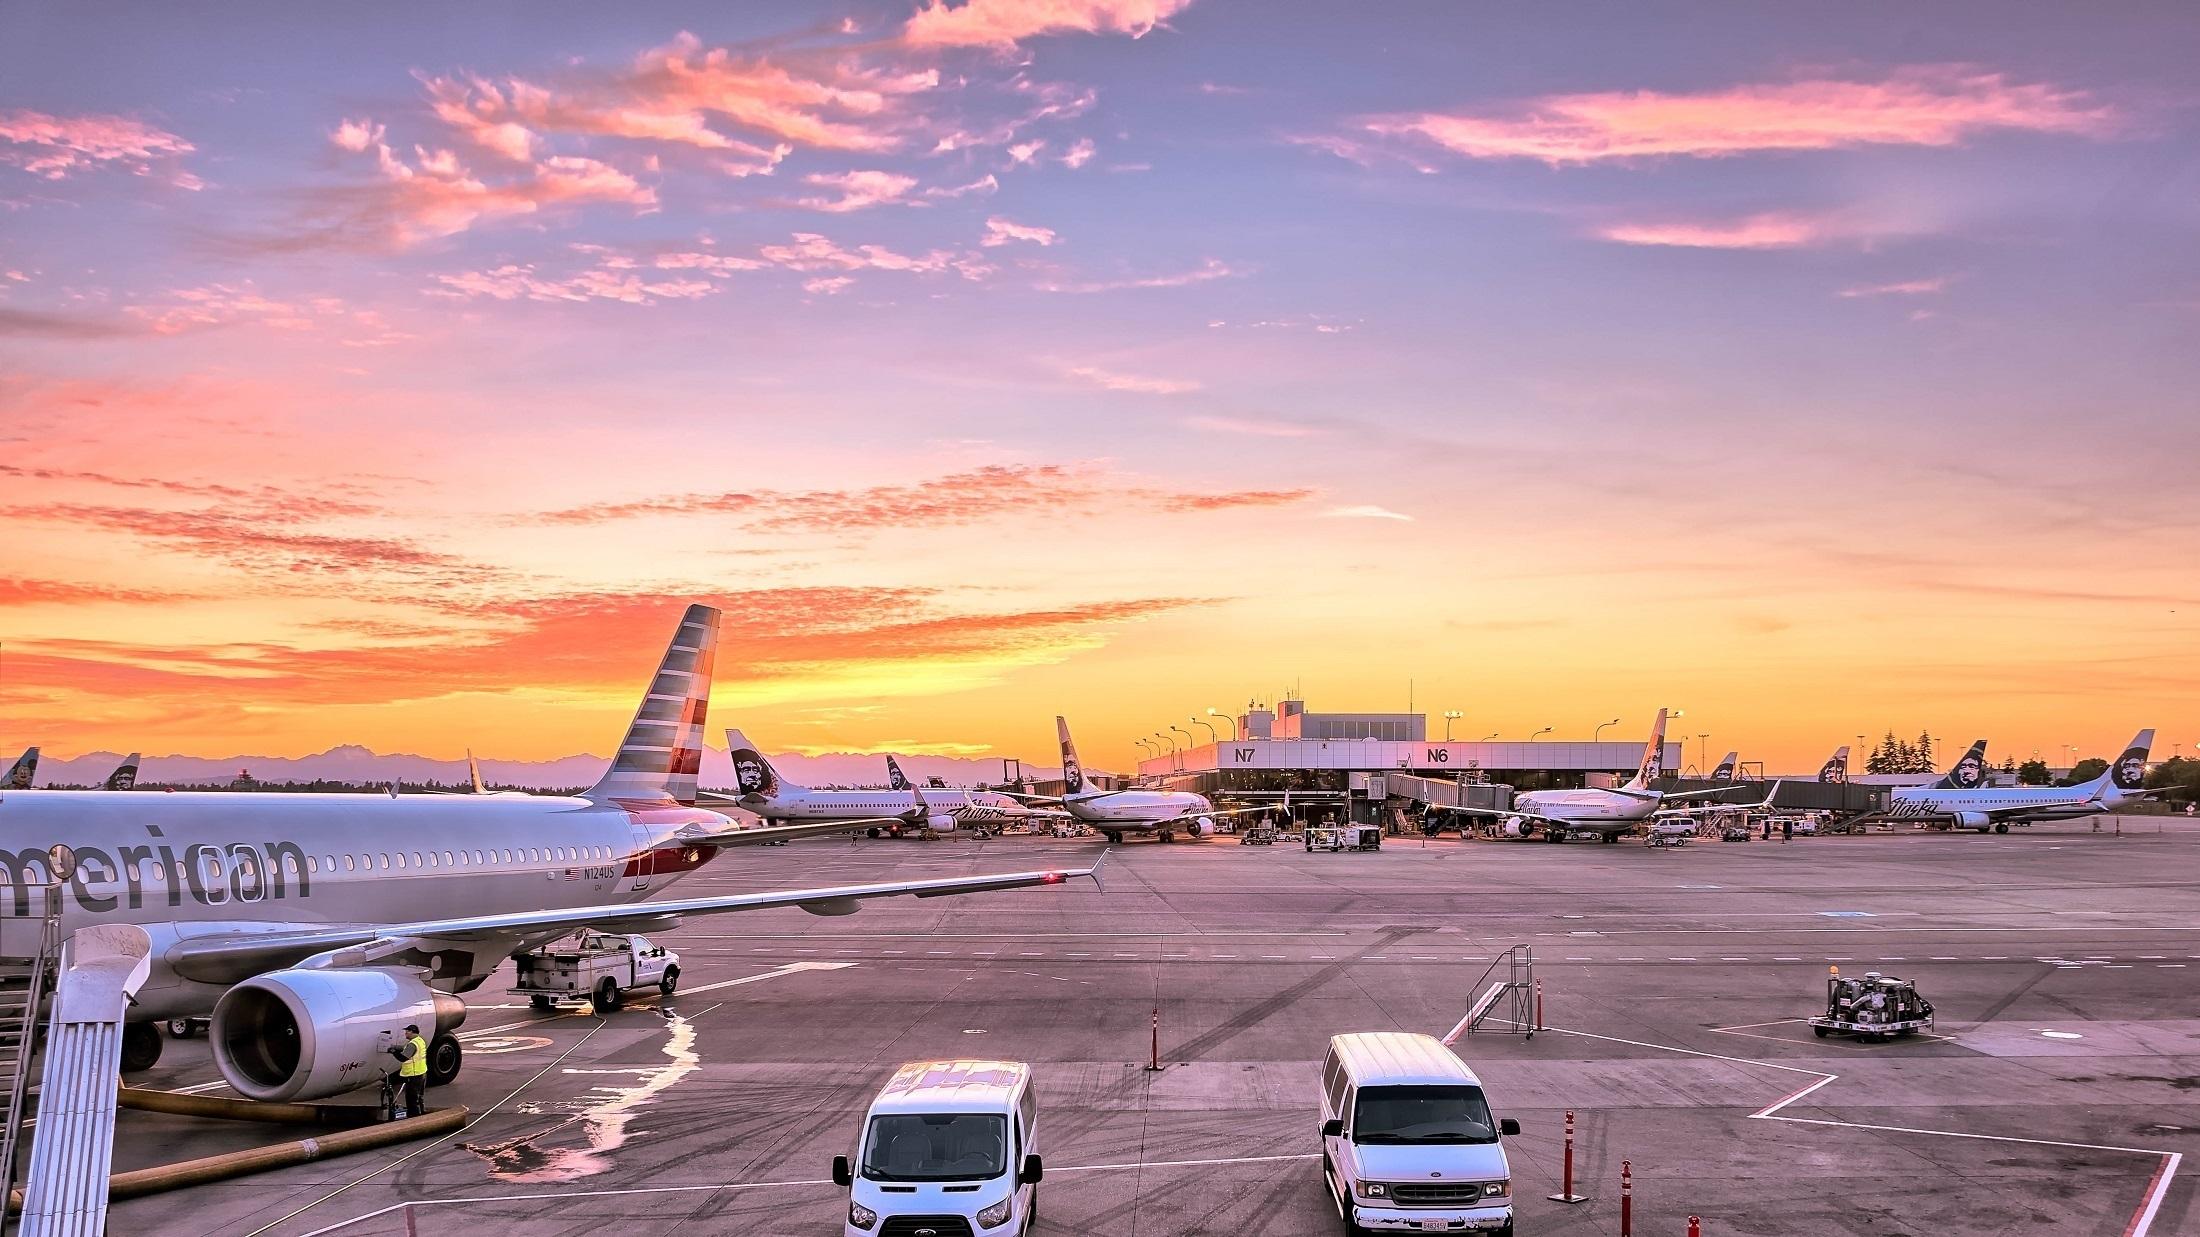 airport-airplanes-gates-flight-line-163771.jpg